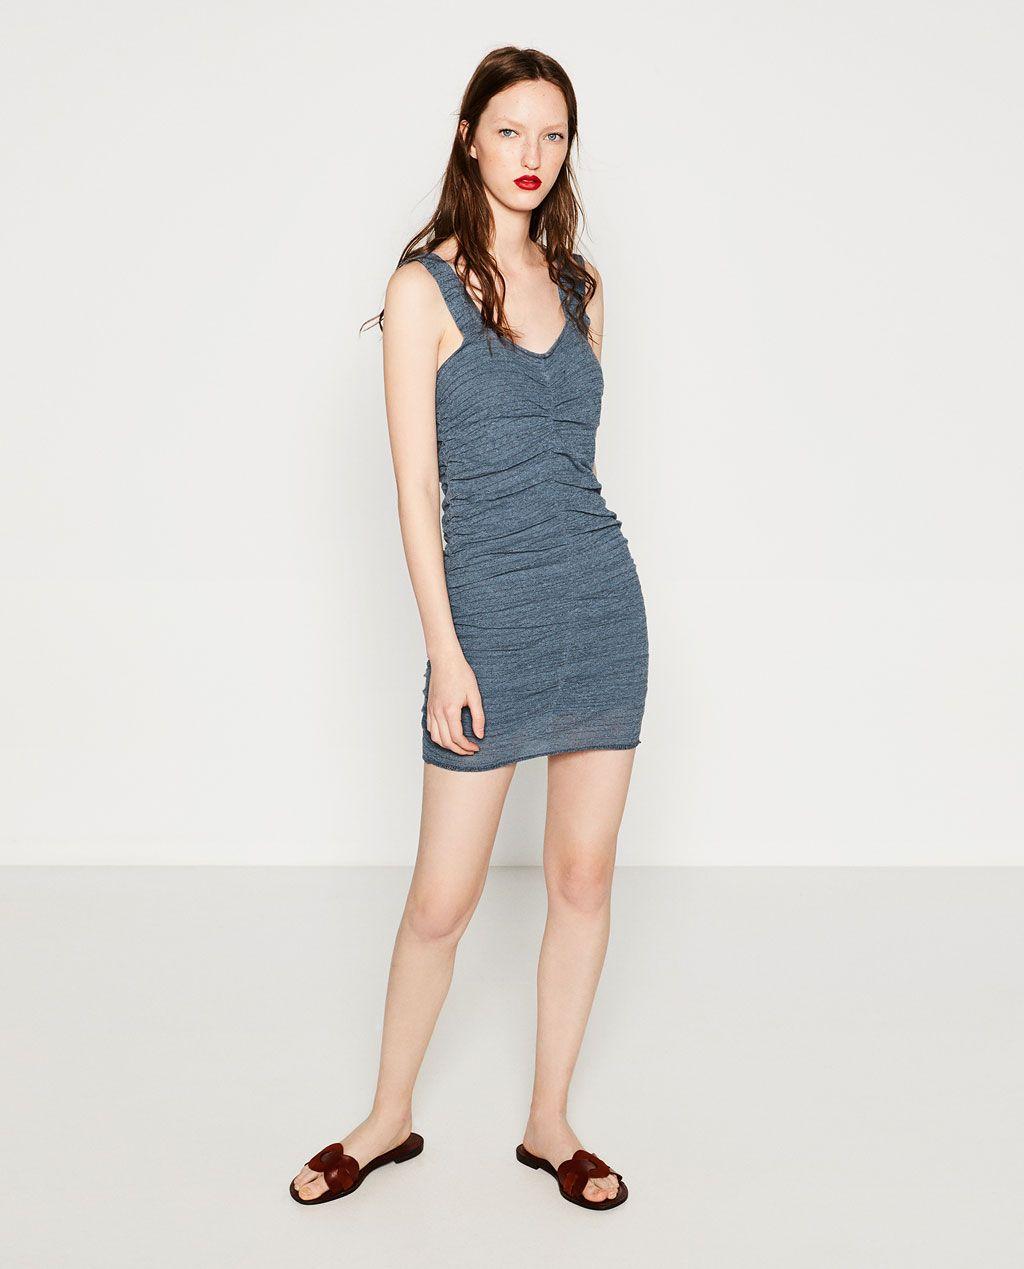 62b95711400d6 MINI DRAPED DRESS-View All-DRESSES-WOMAN | ZARA United States | Style